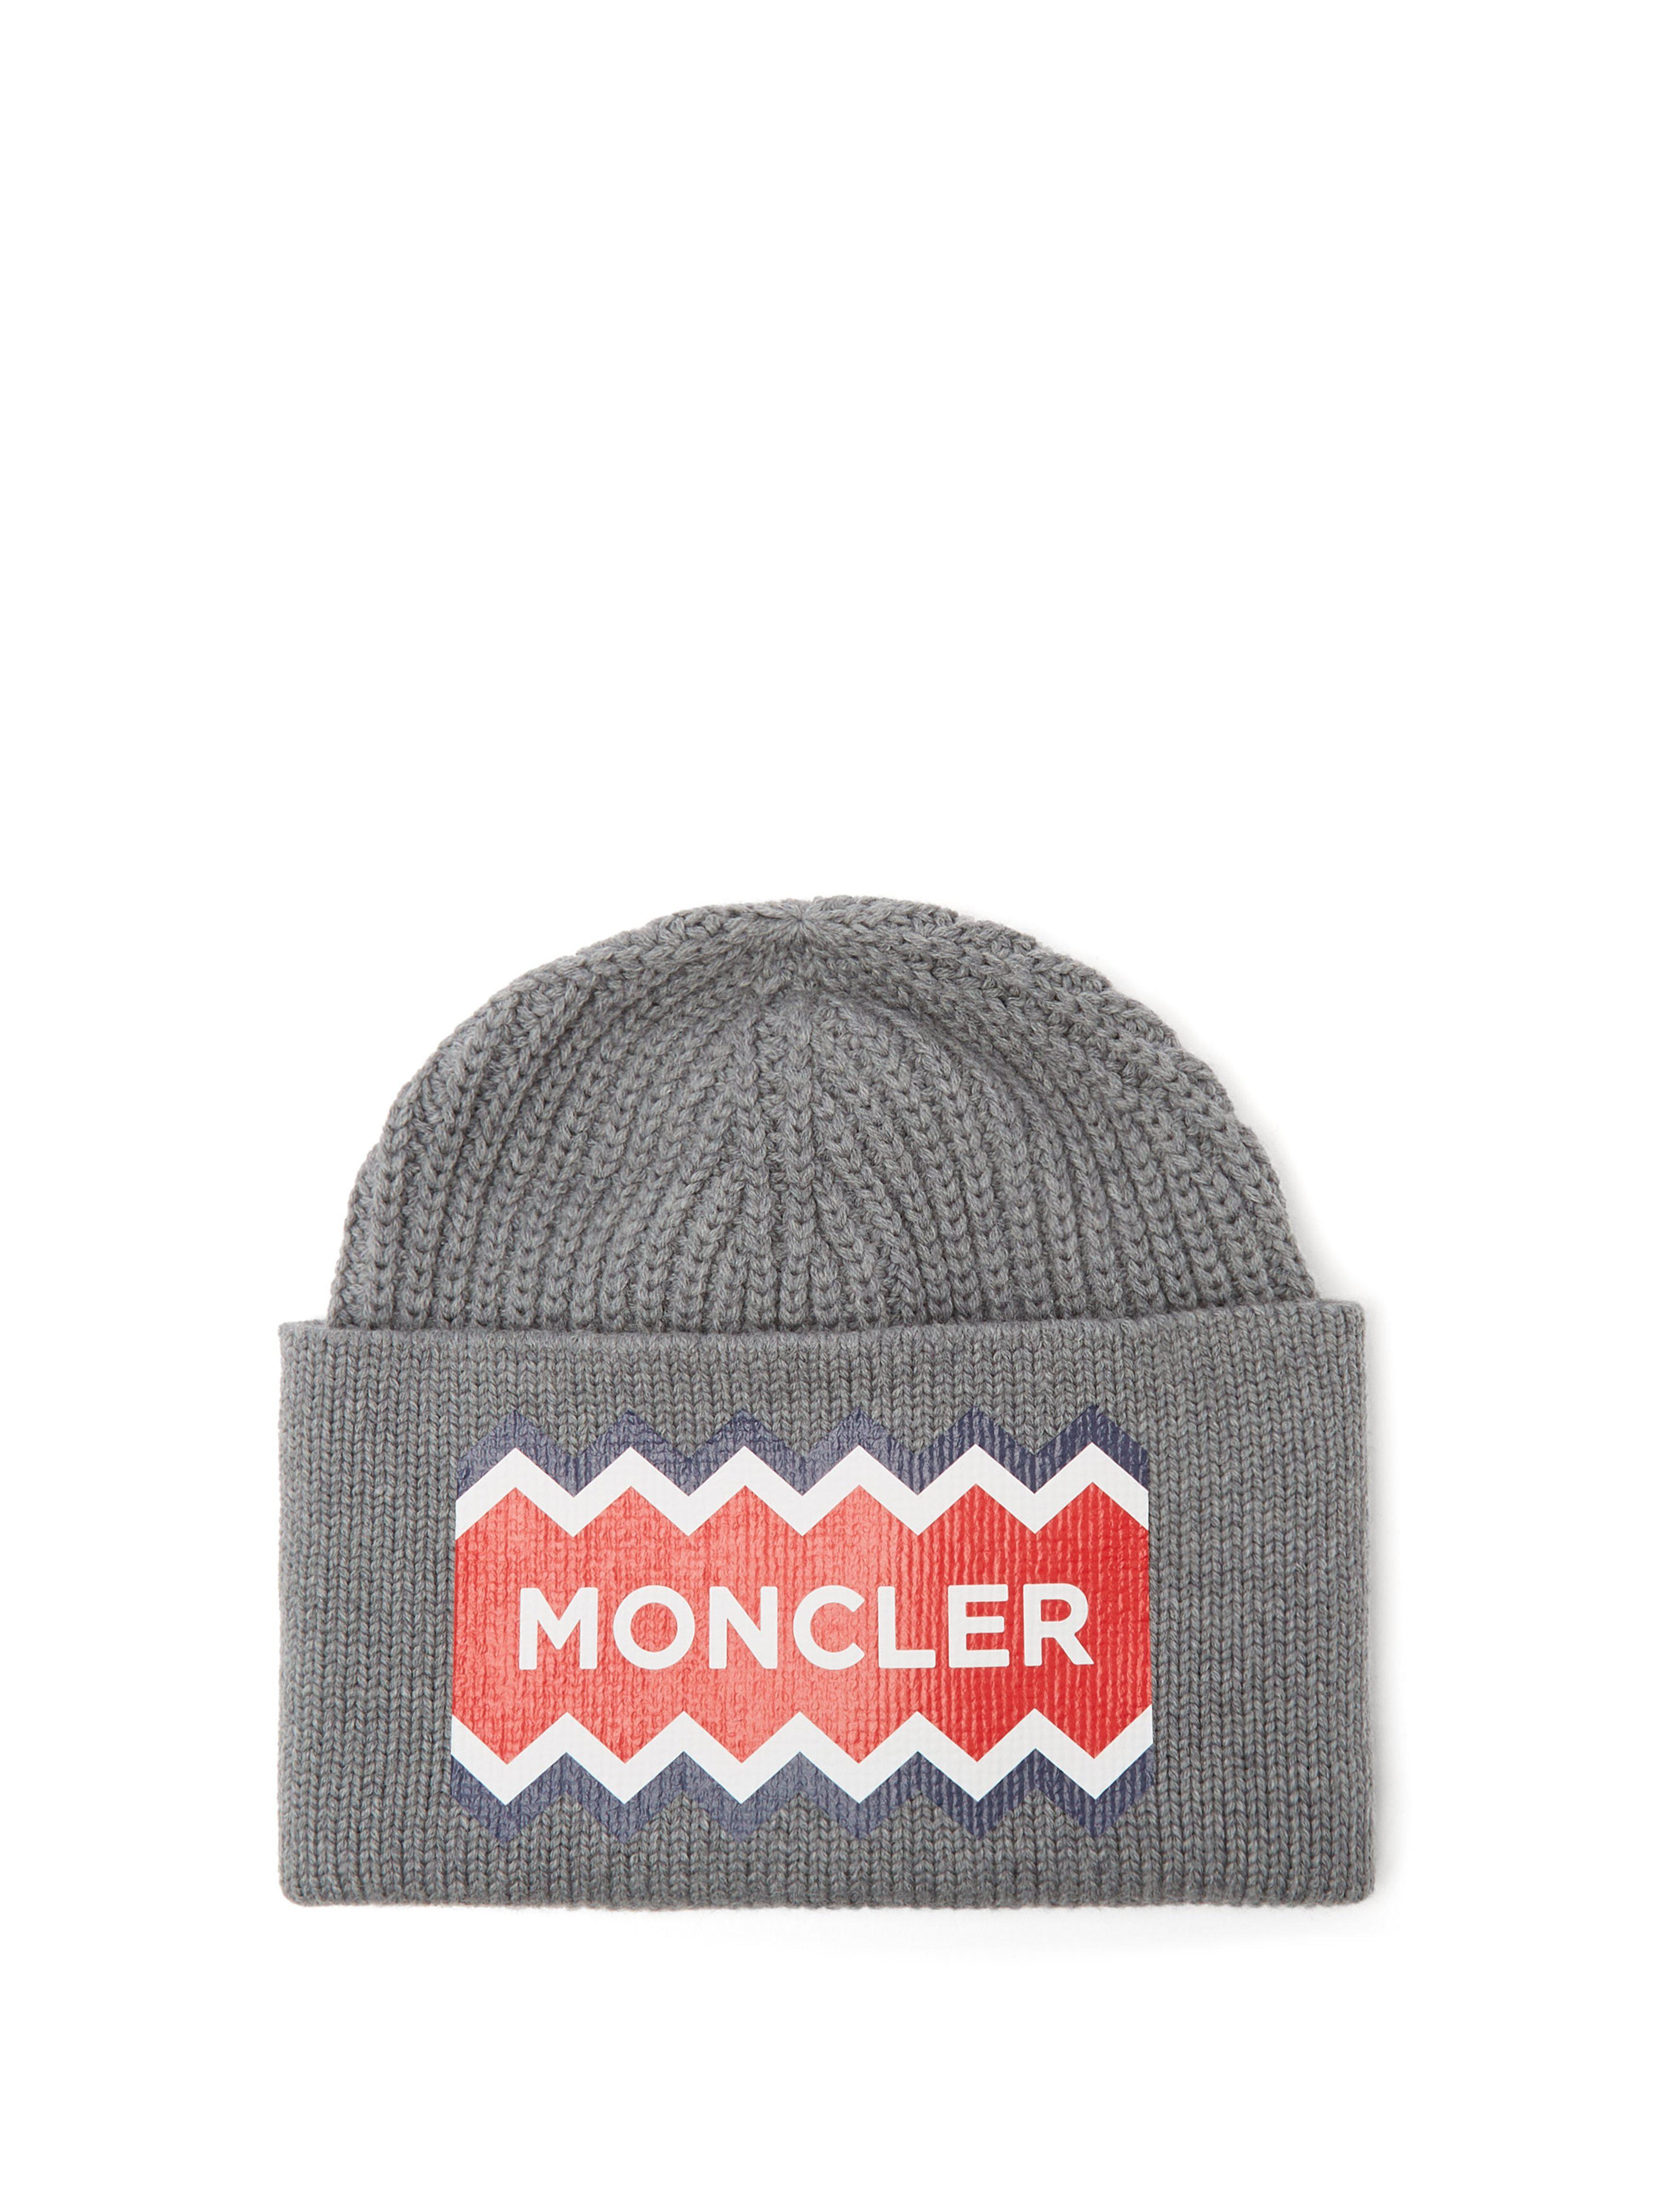 82cf1368d6f Moncler - Gray Logo Print Wool Beanie Hat for Men - Lyst. View fullscreen